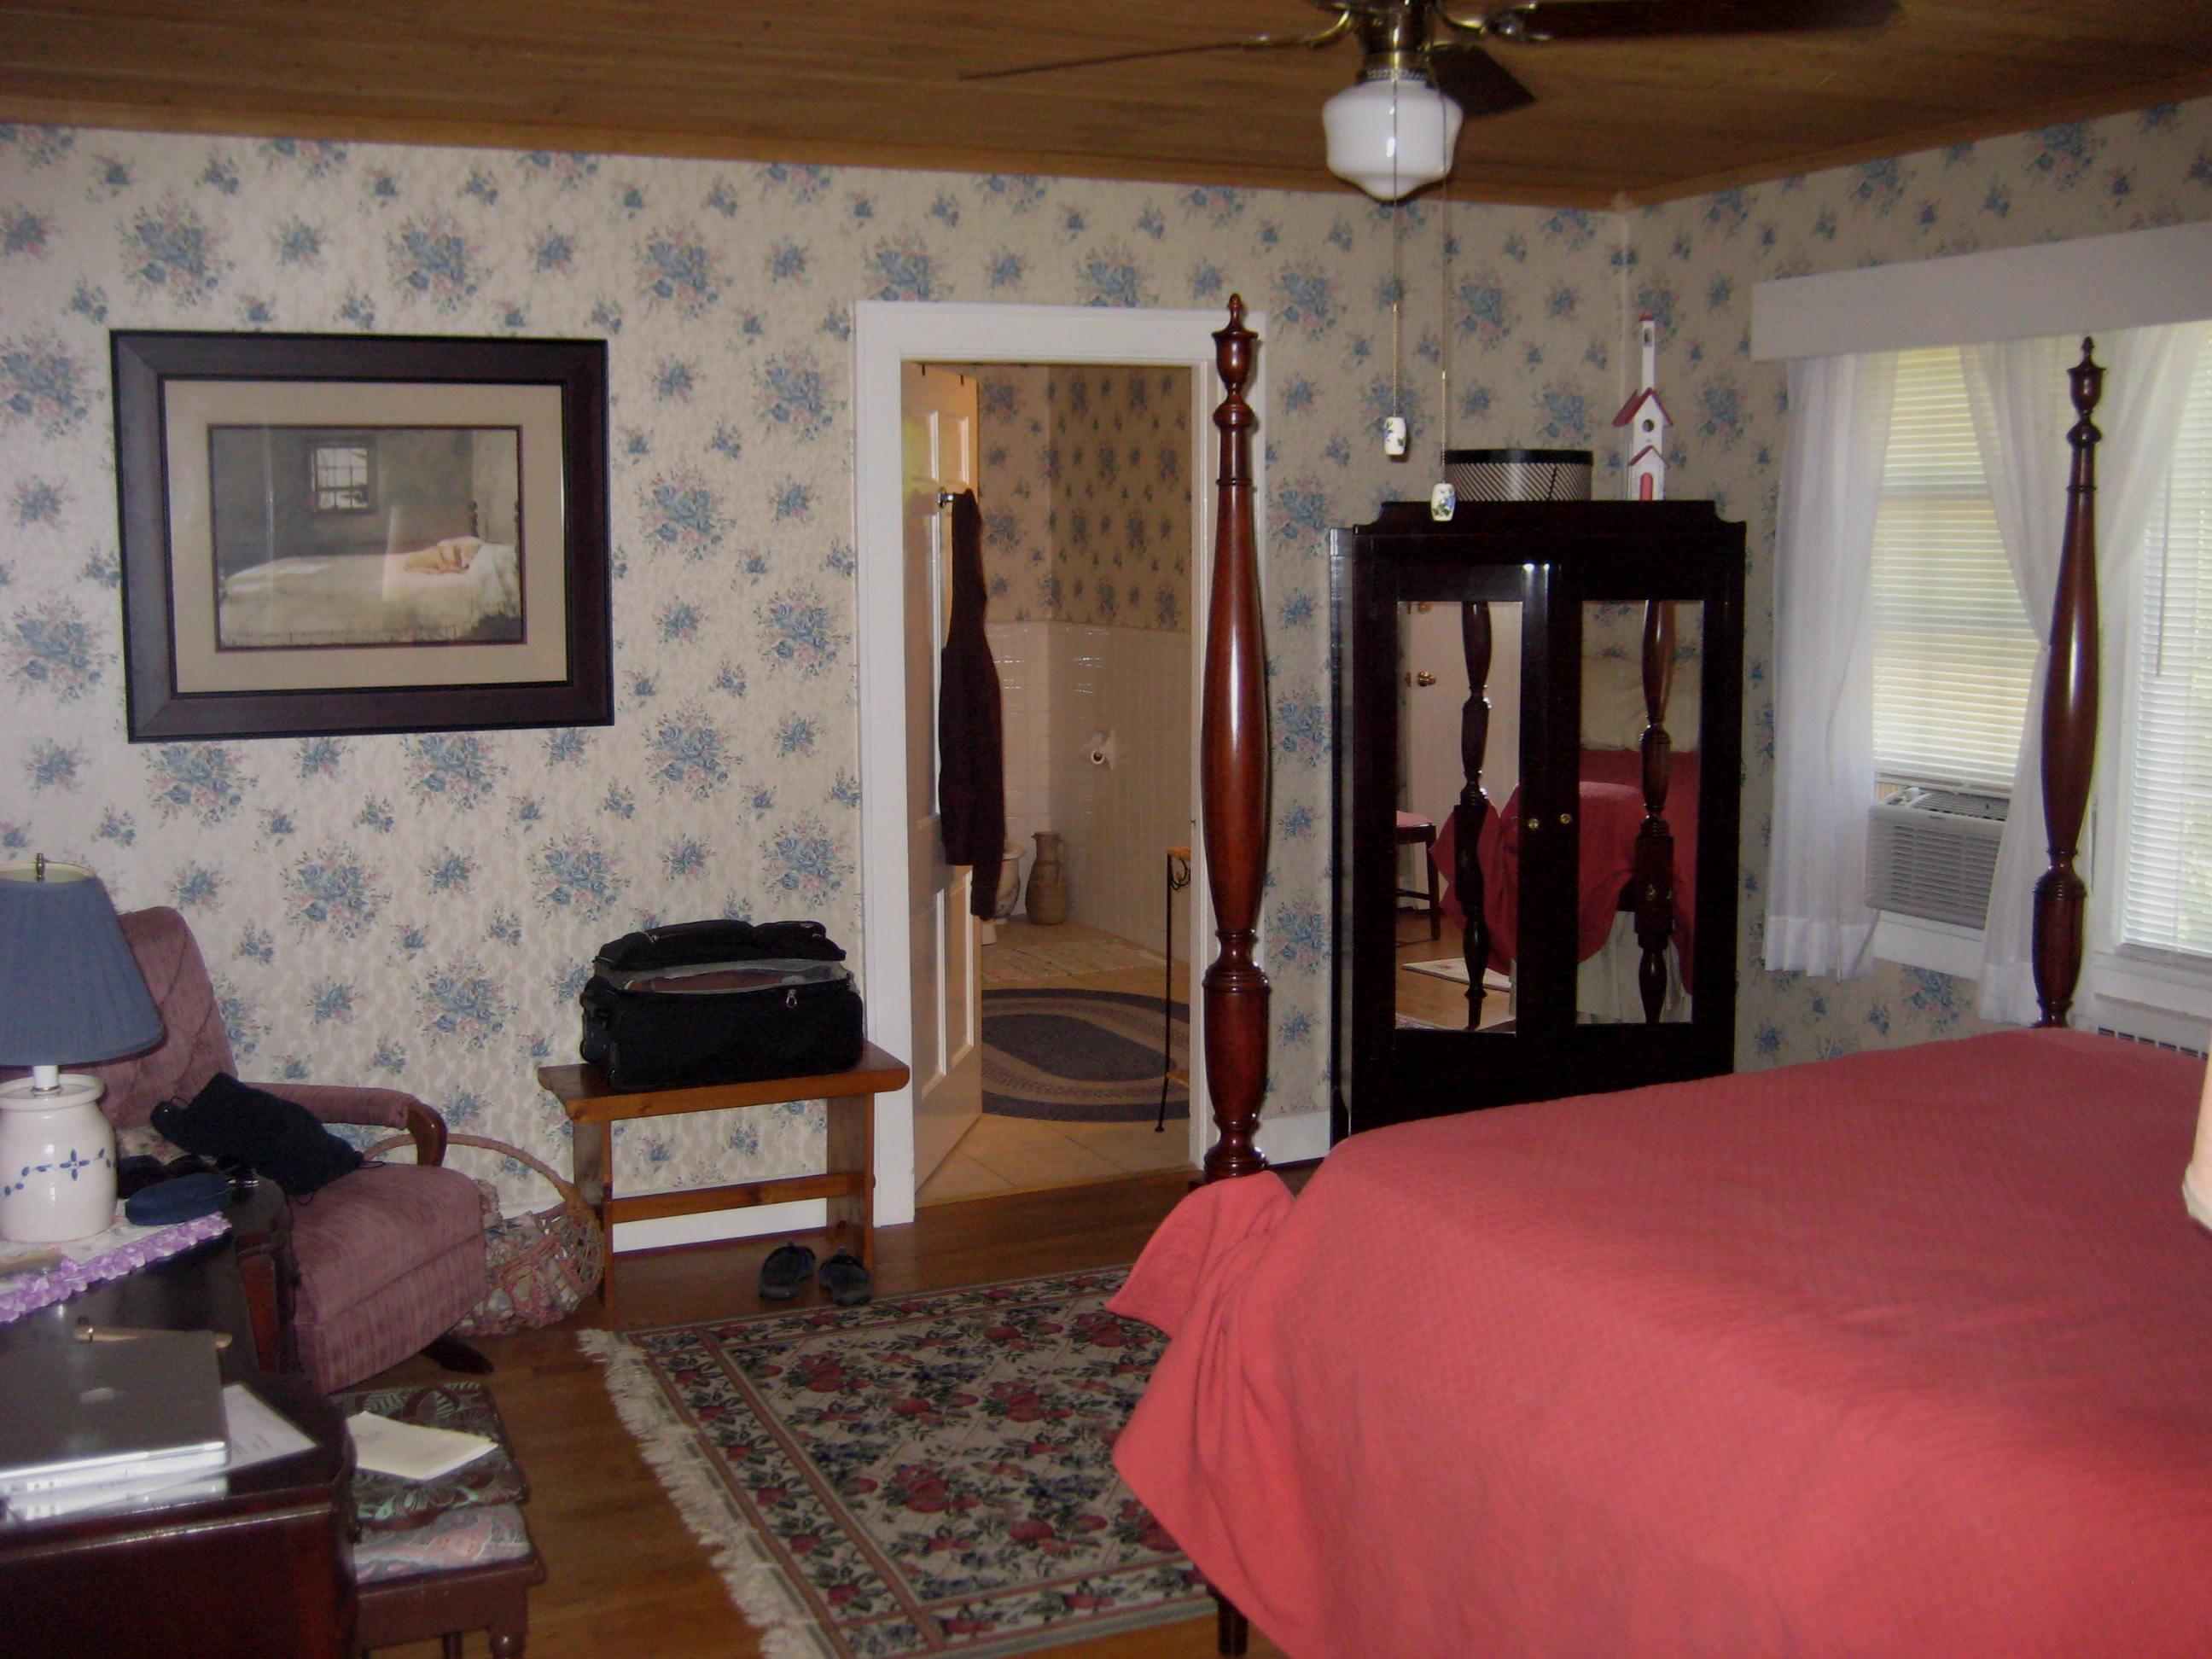 Richmond Inn Bed and Breakfast